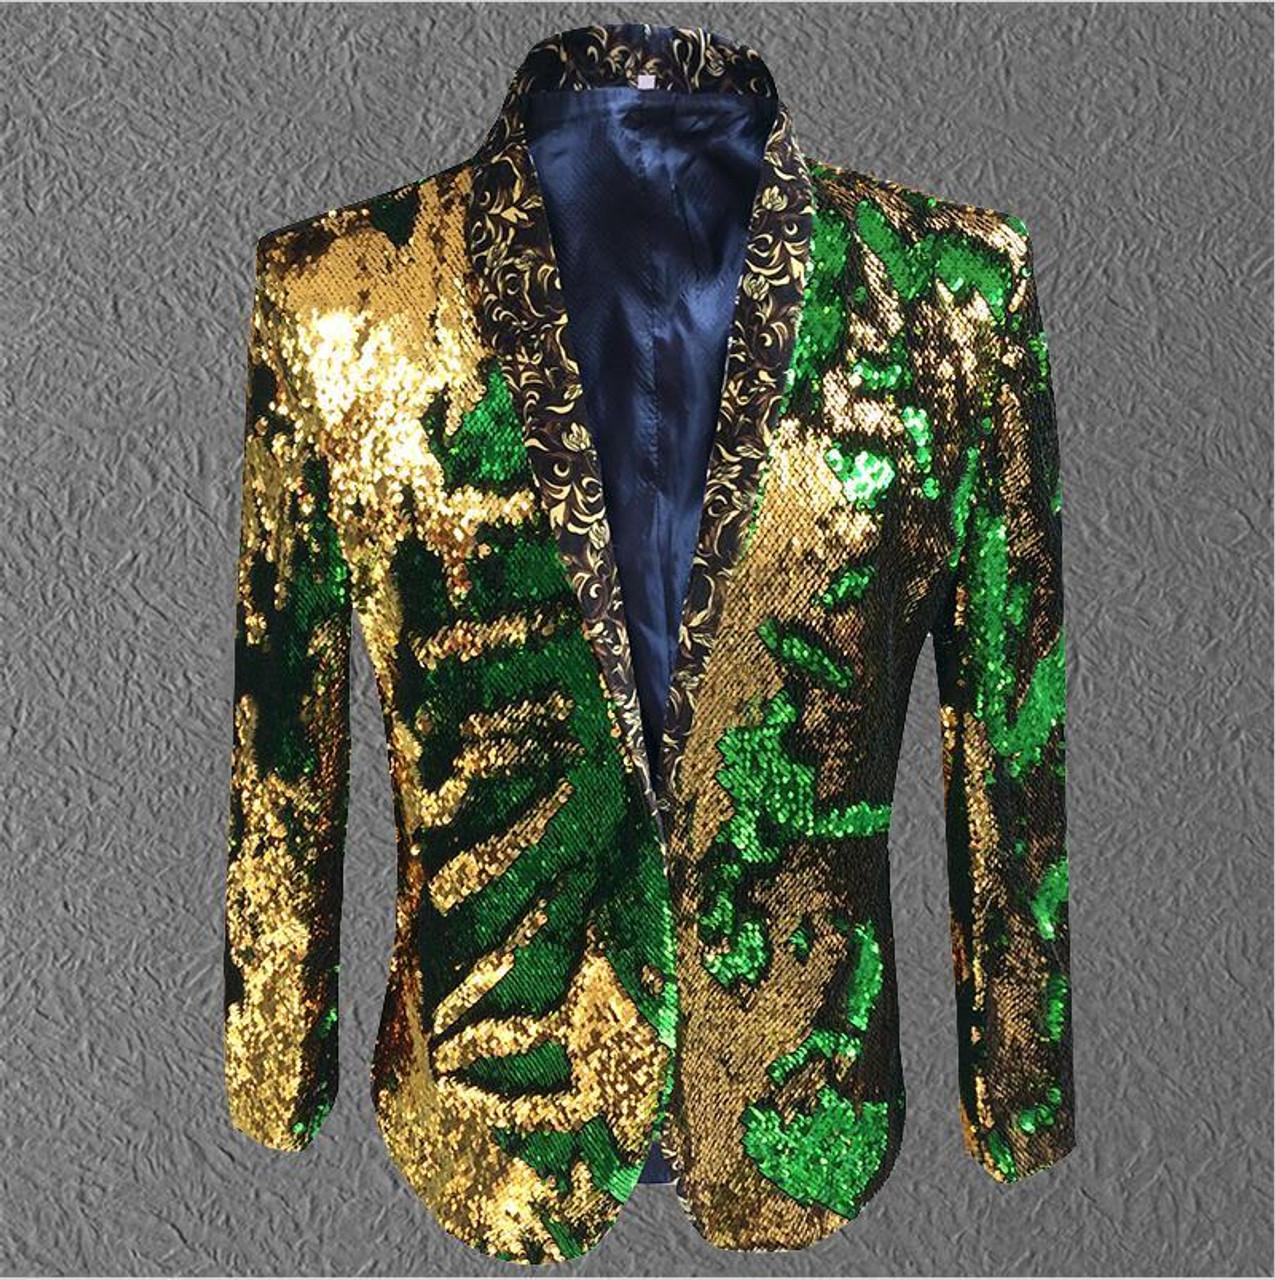 4fda8aa2df6a27 ... jacket men sequin Gold Green Blazer Men Suit Coat Male Costume Prom  Wedding Groom Outfit Singer ...